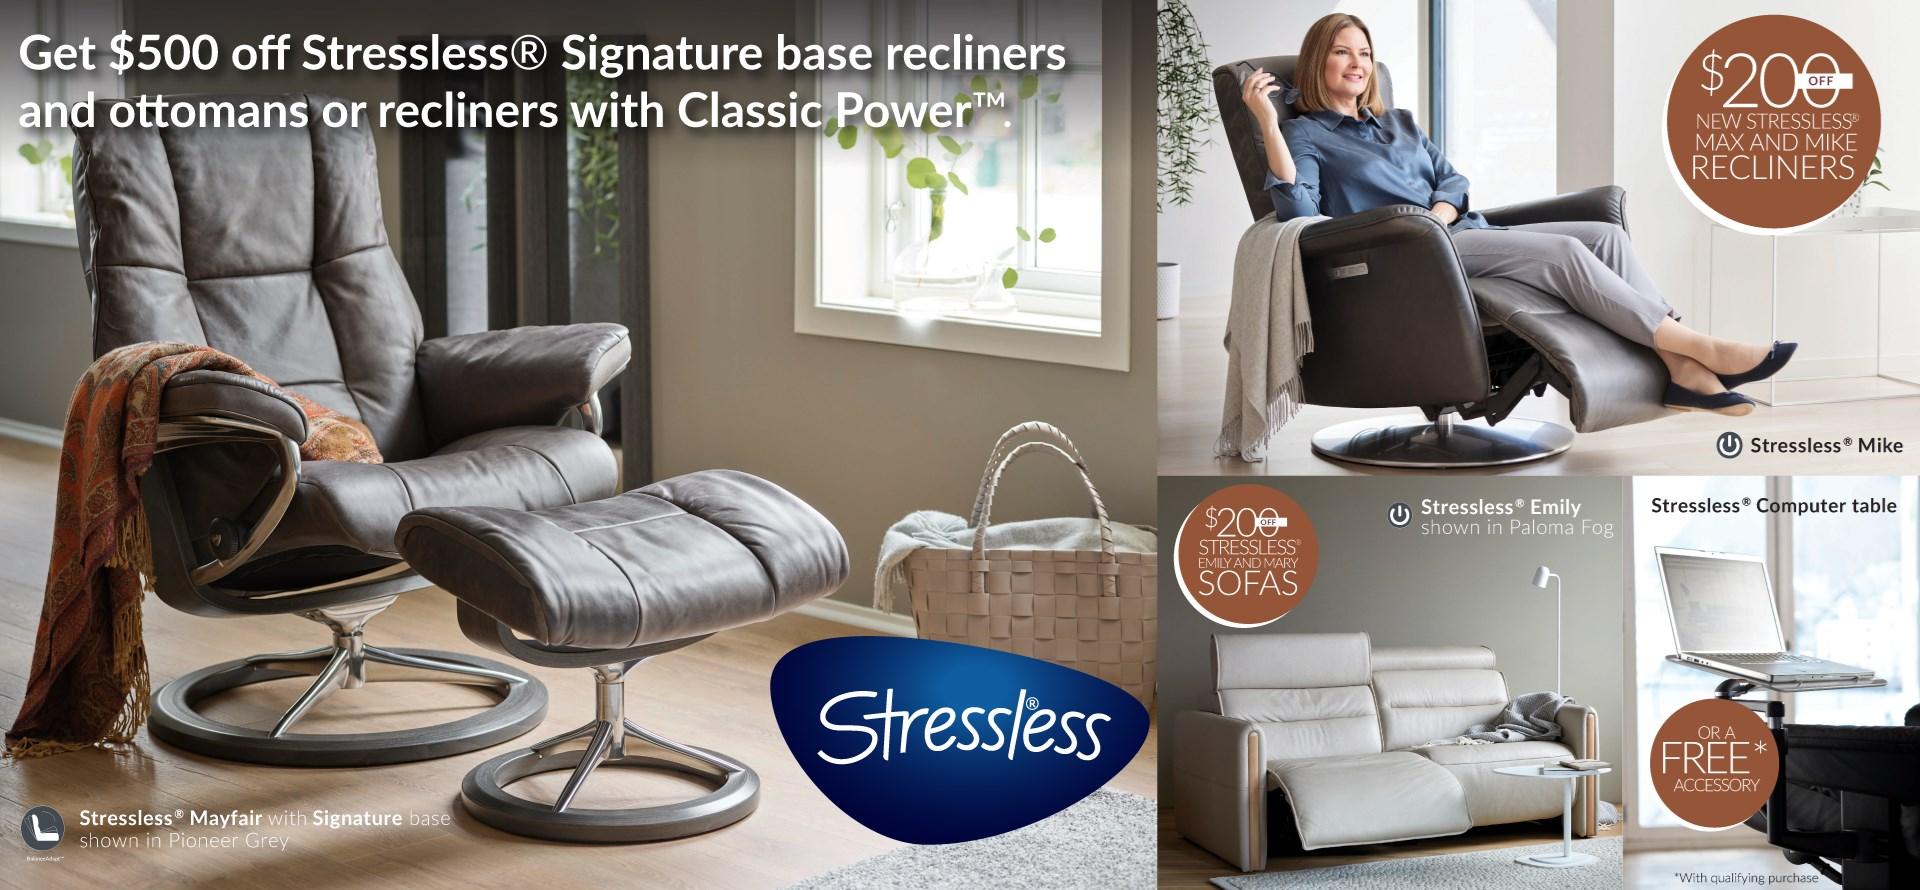 Stressless Base Plus Promotion